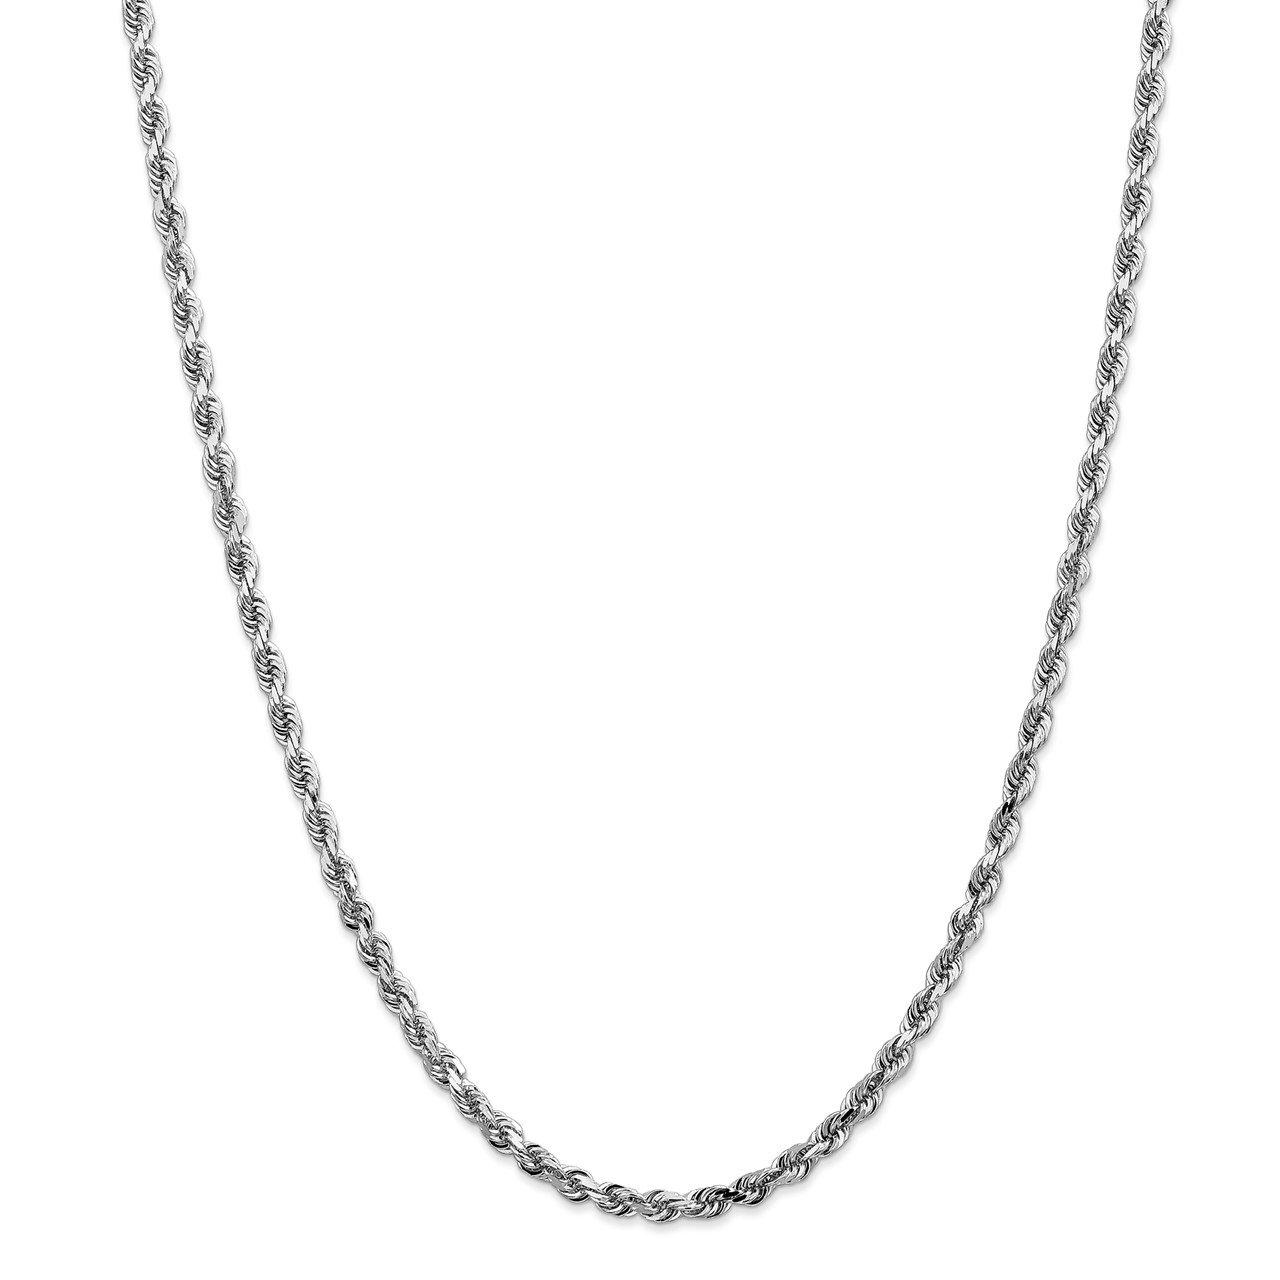 14k White Gold 4mm D/C Quadruple Rope Chain